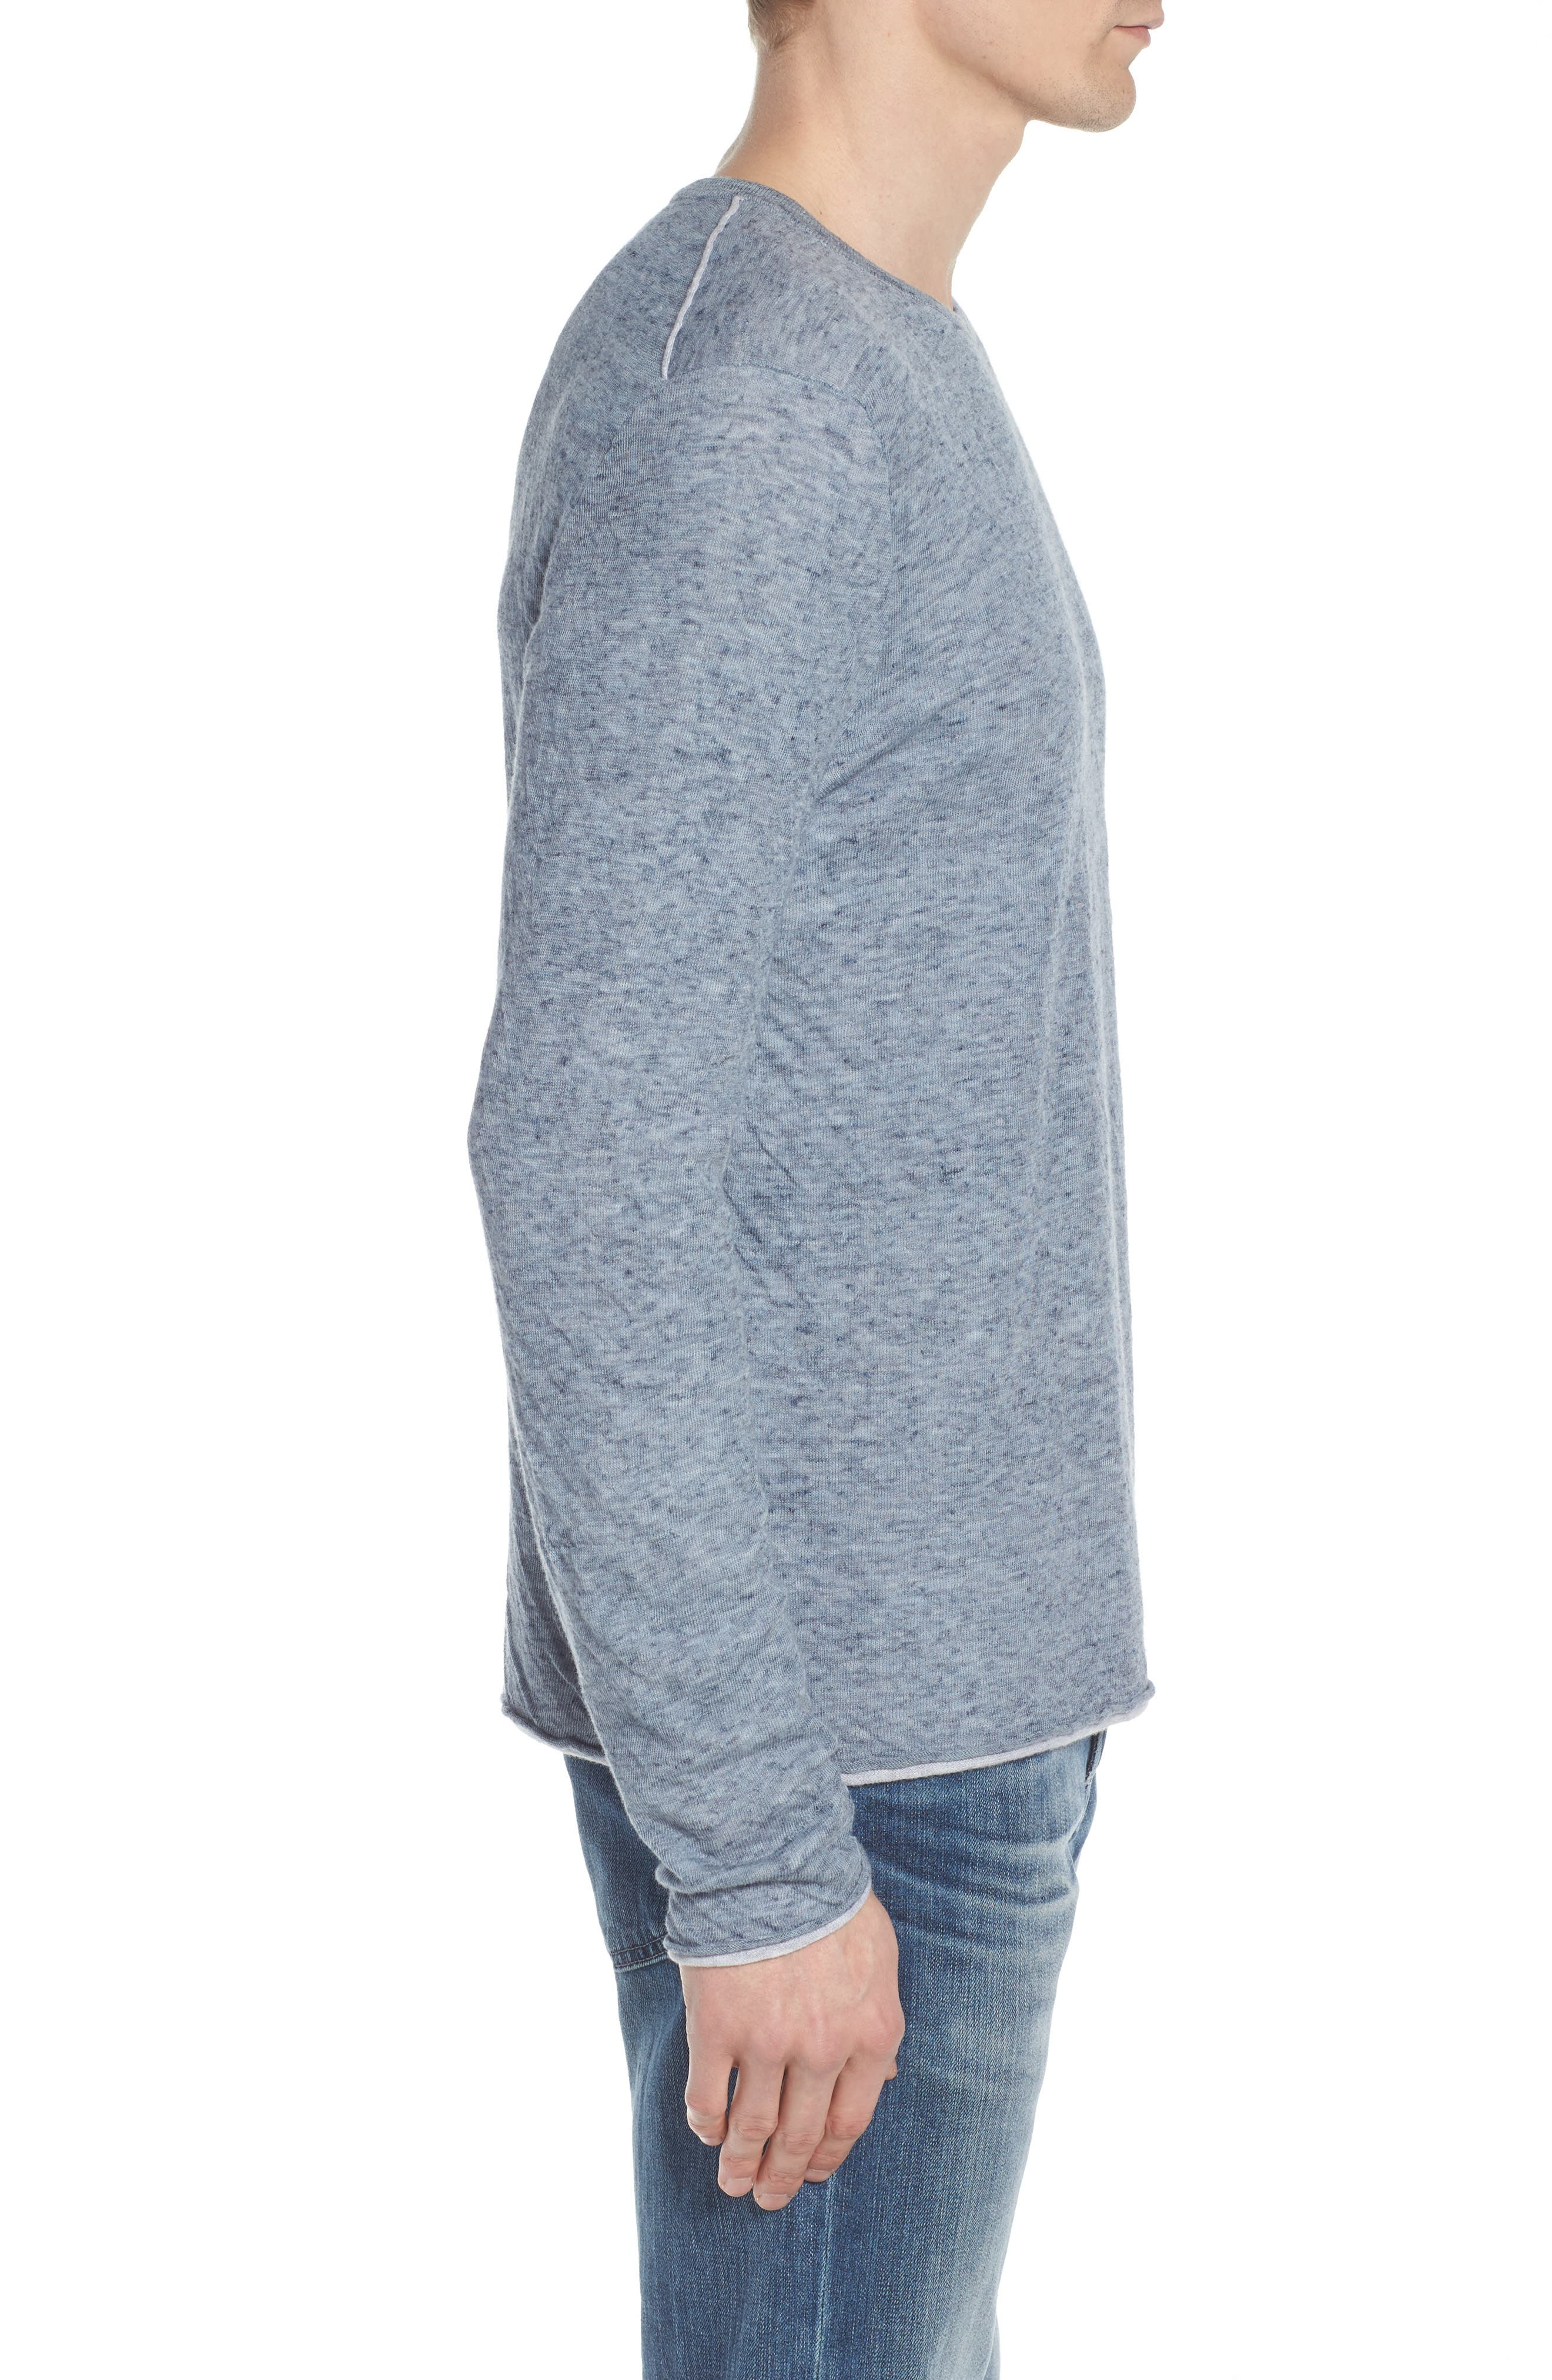 Tripp Regular Fit Crewneck Shirt,                             Alternate thumbnail 3, color,                             Light Blue